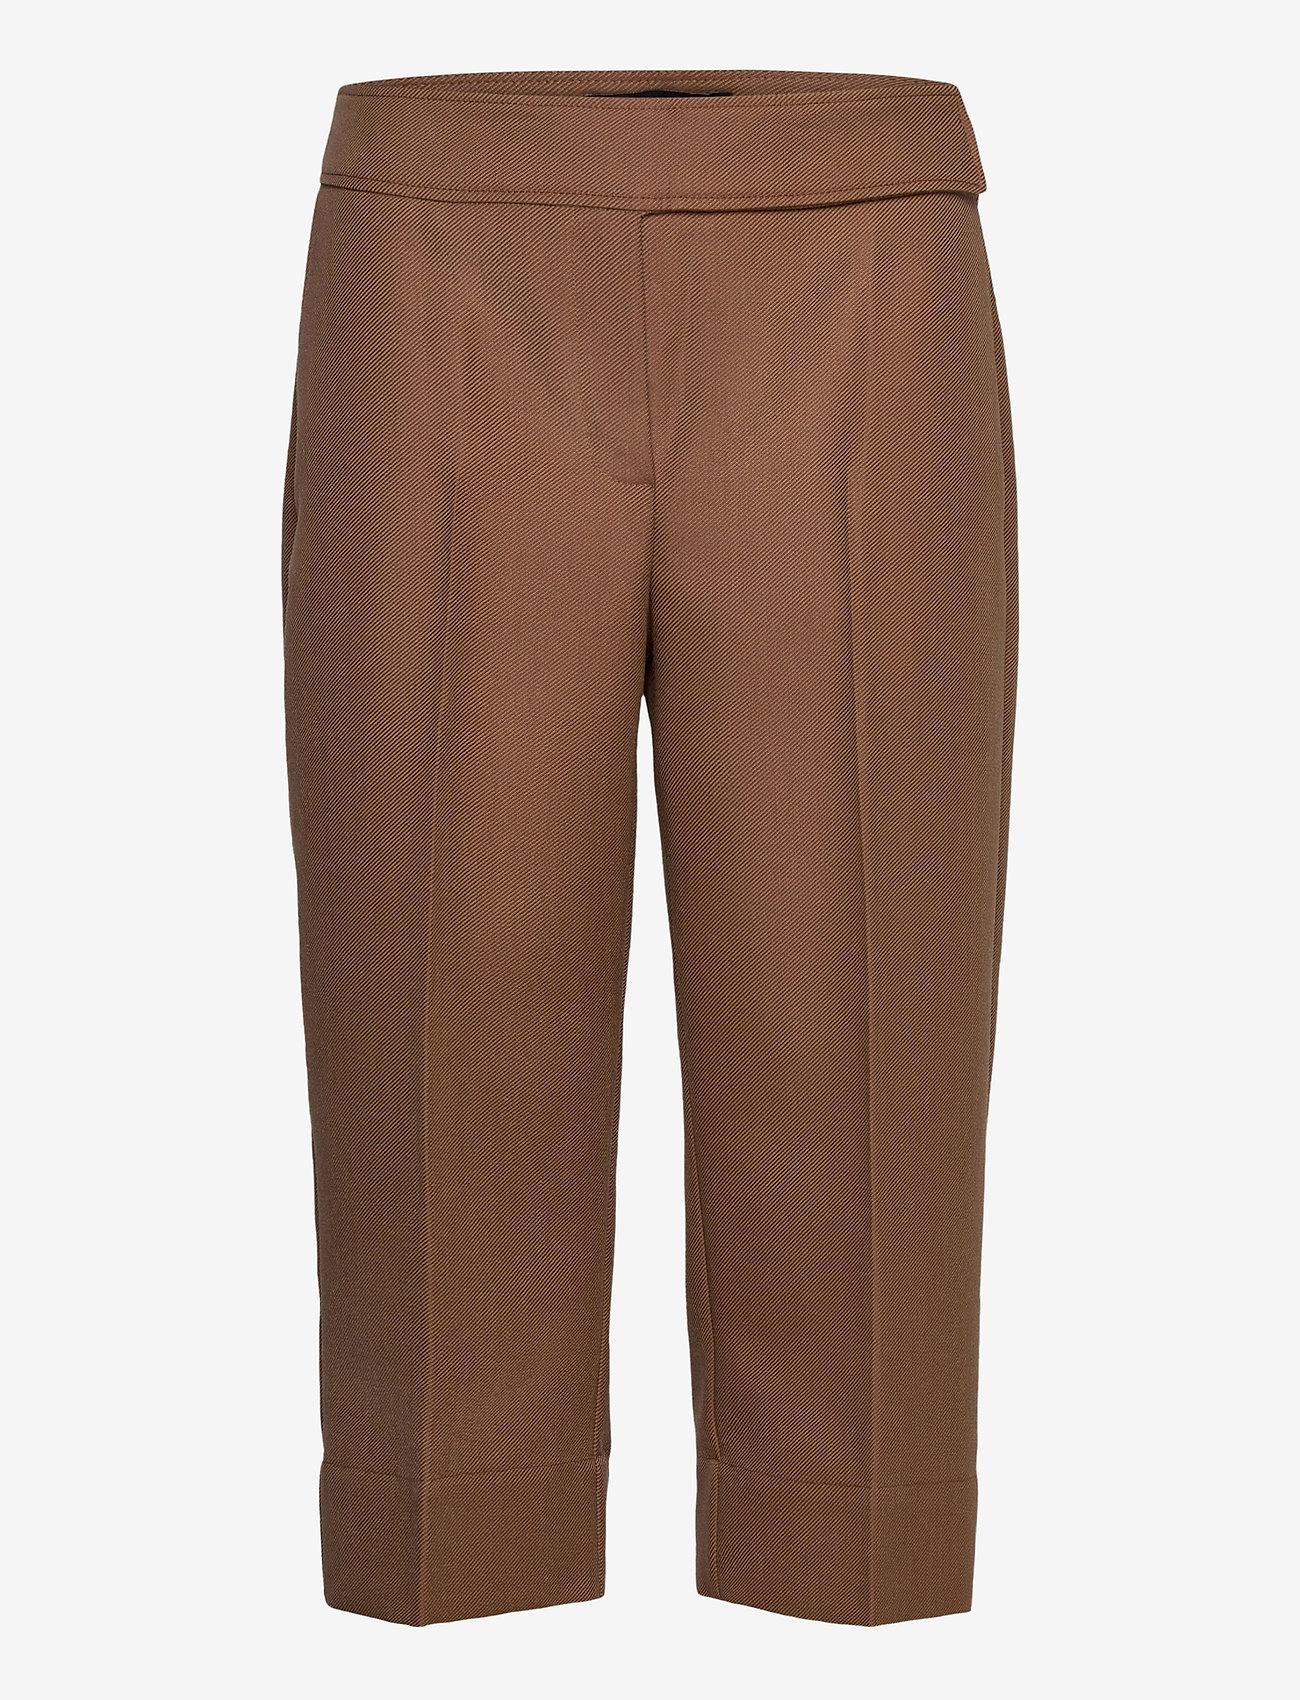 Birgitte Herskind - Banks  Shorts - bermudas - androa brown - 0